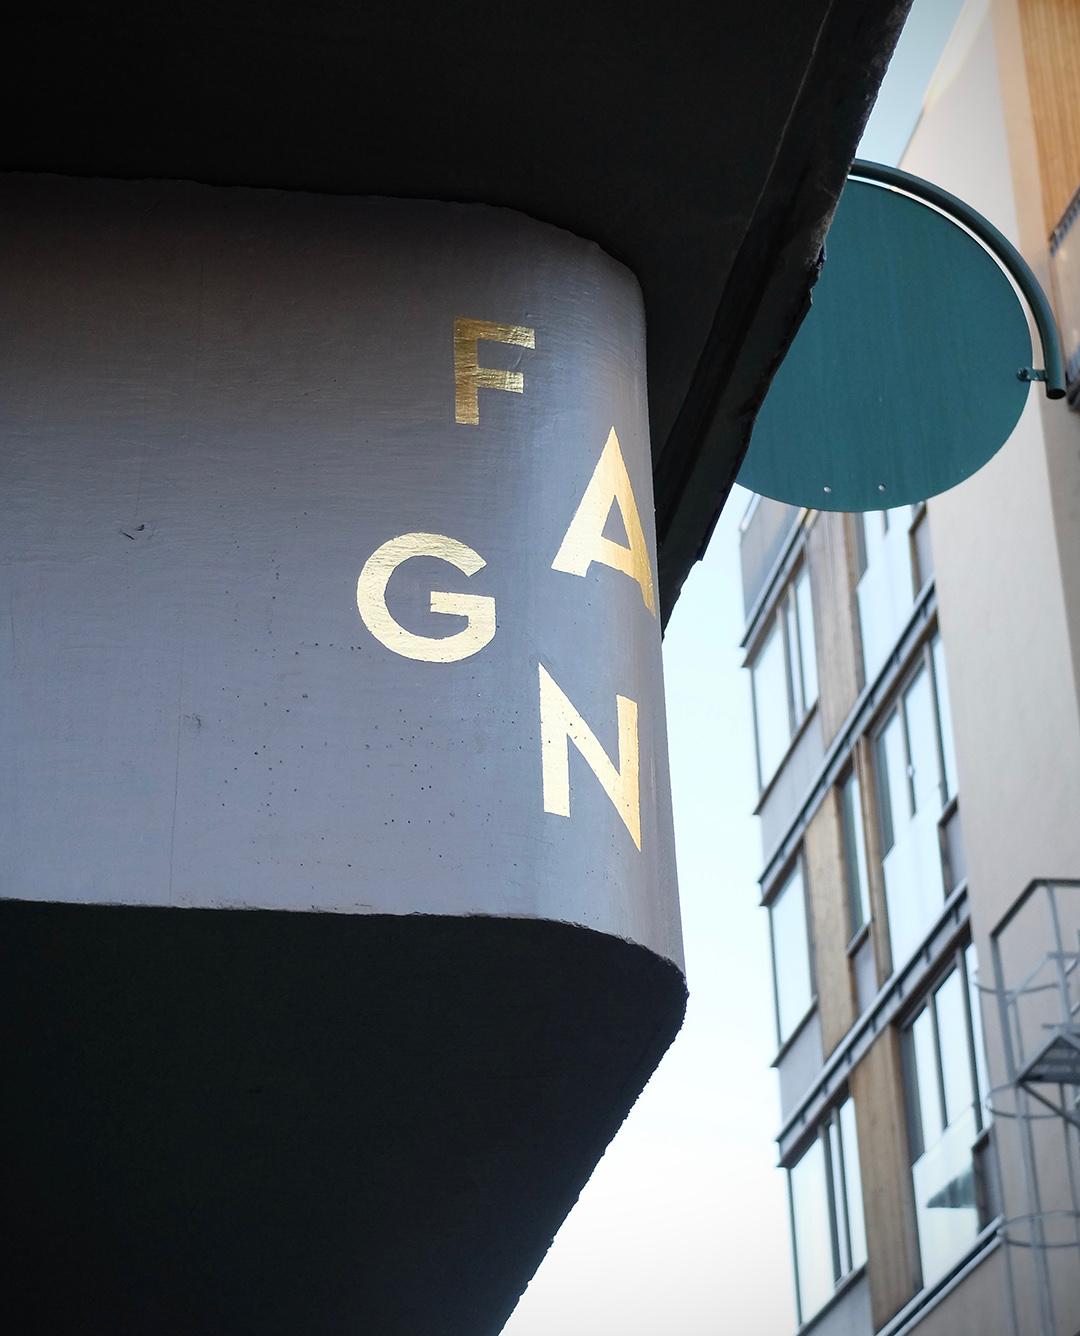 Fagn_skilt_web.jpg